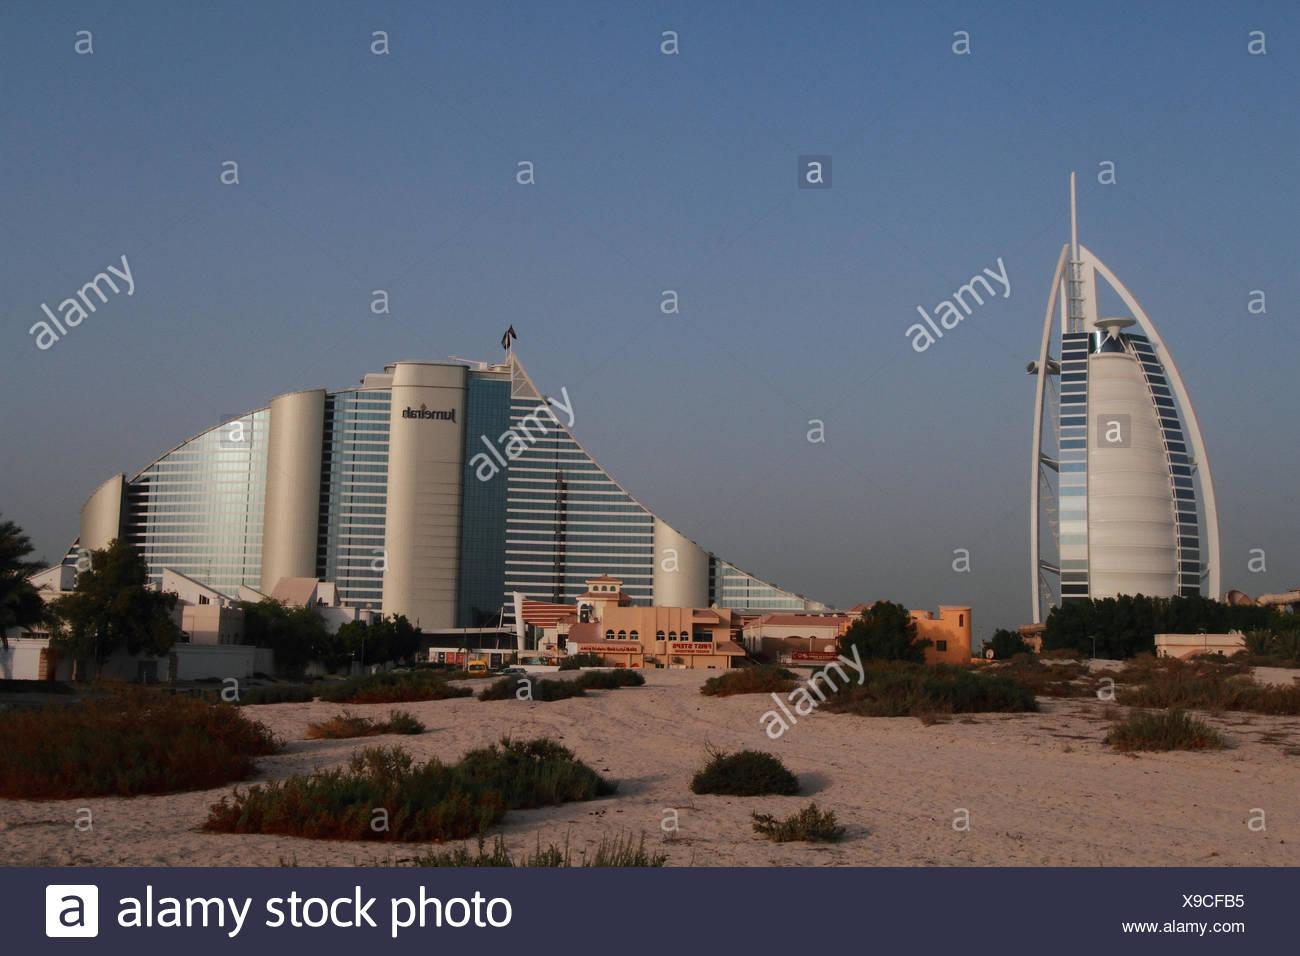 Aerial view of Sir bani Yas Island, Abu Dhabi, UAE. - Stock Image